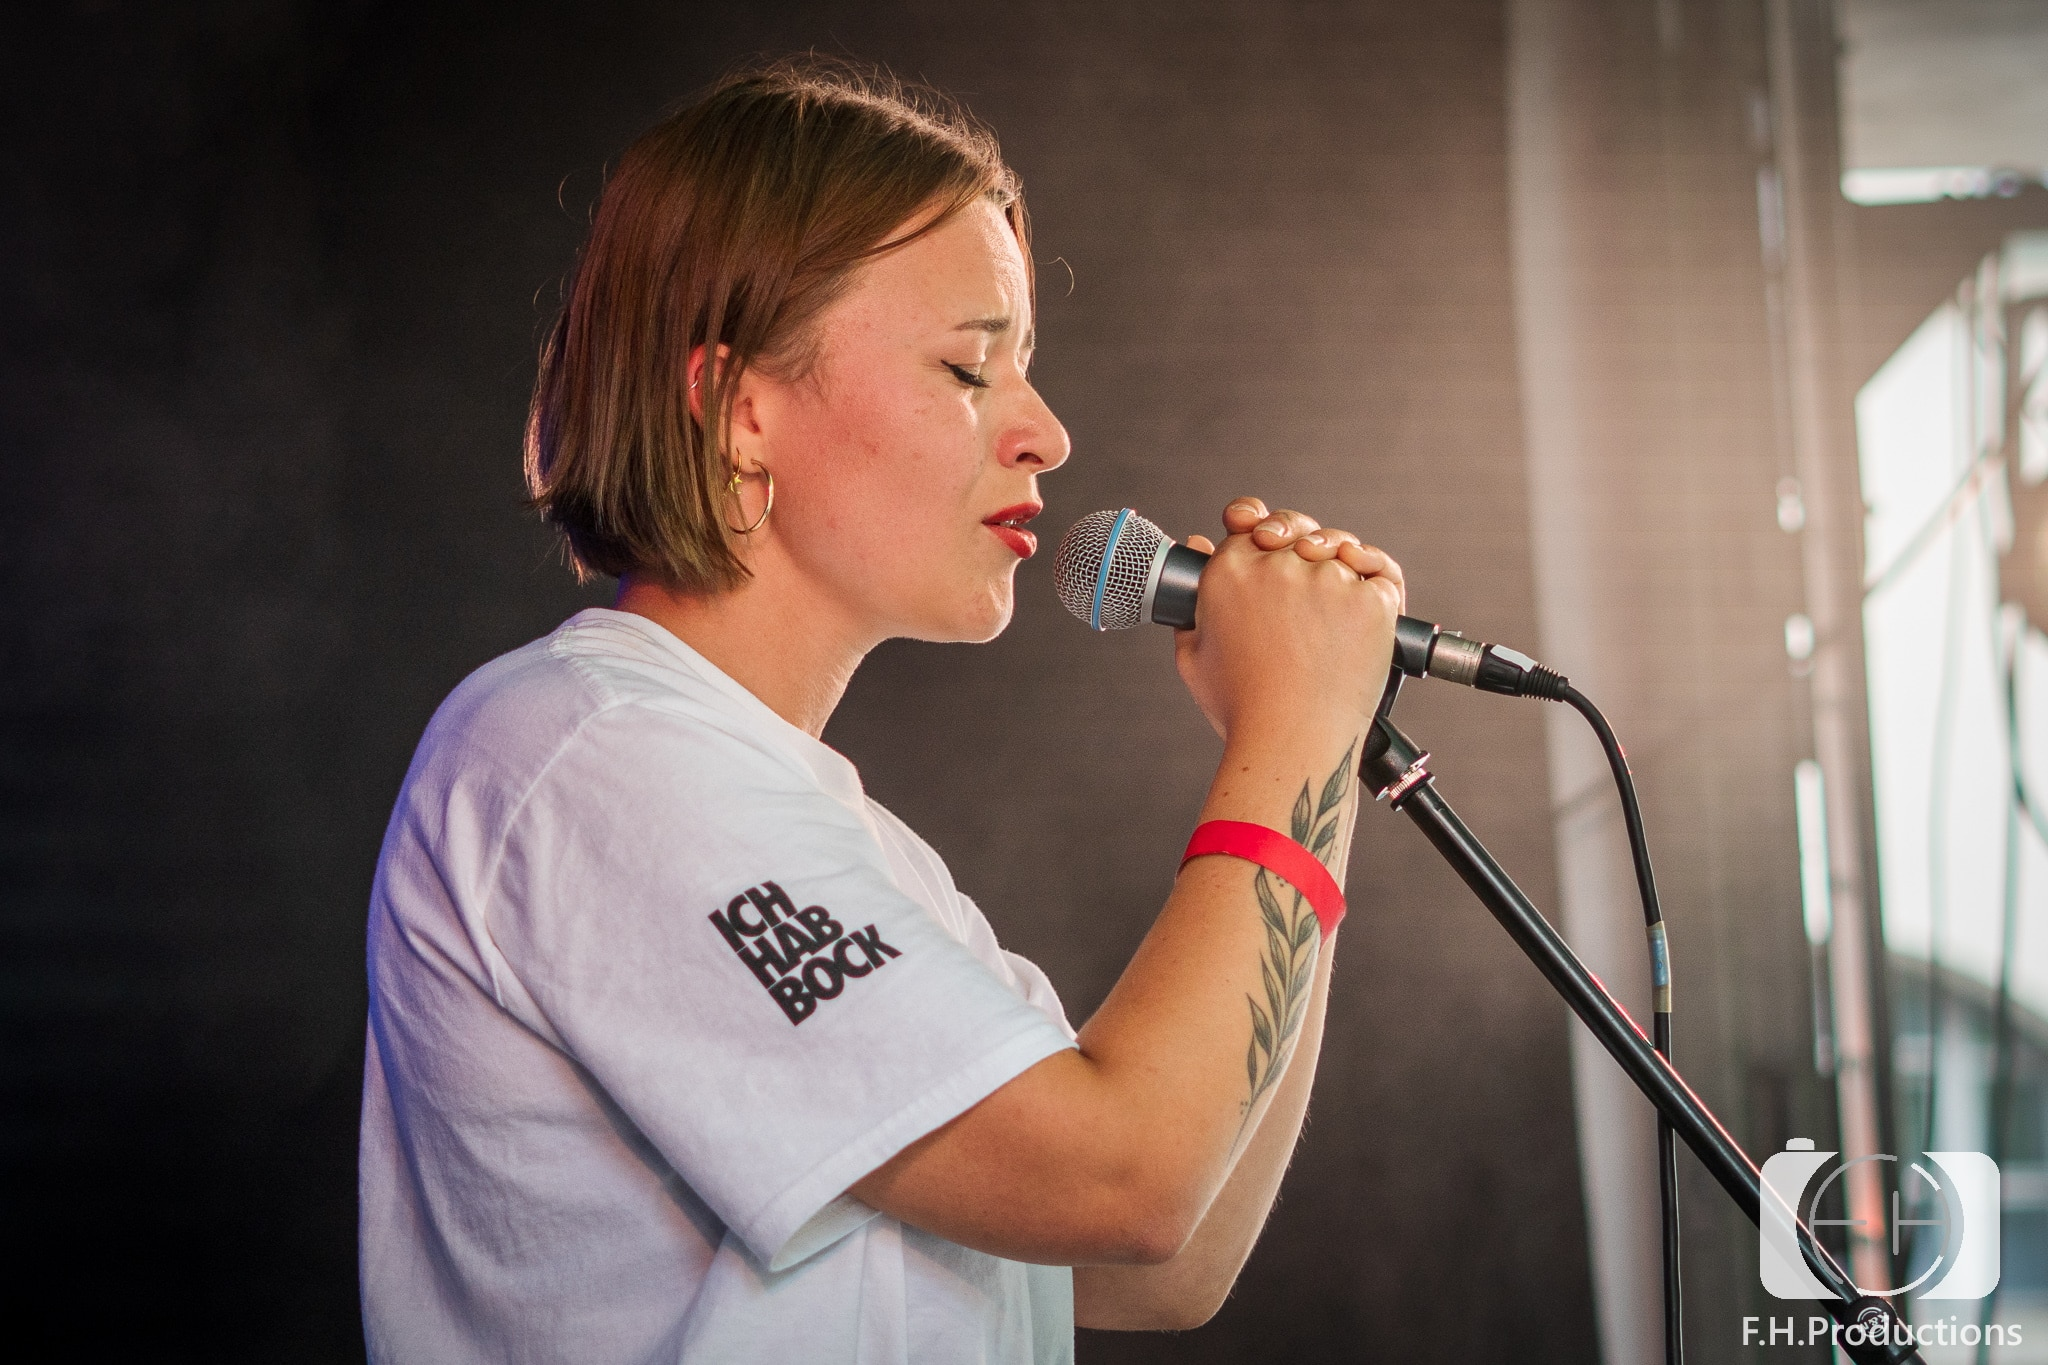 Tamara Roxy 3